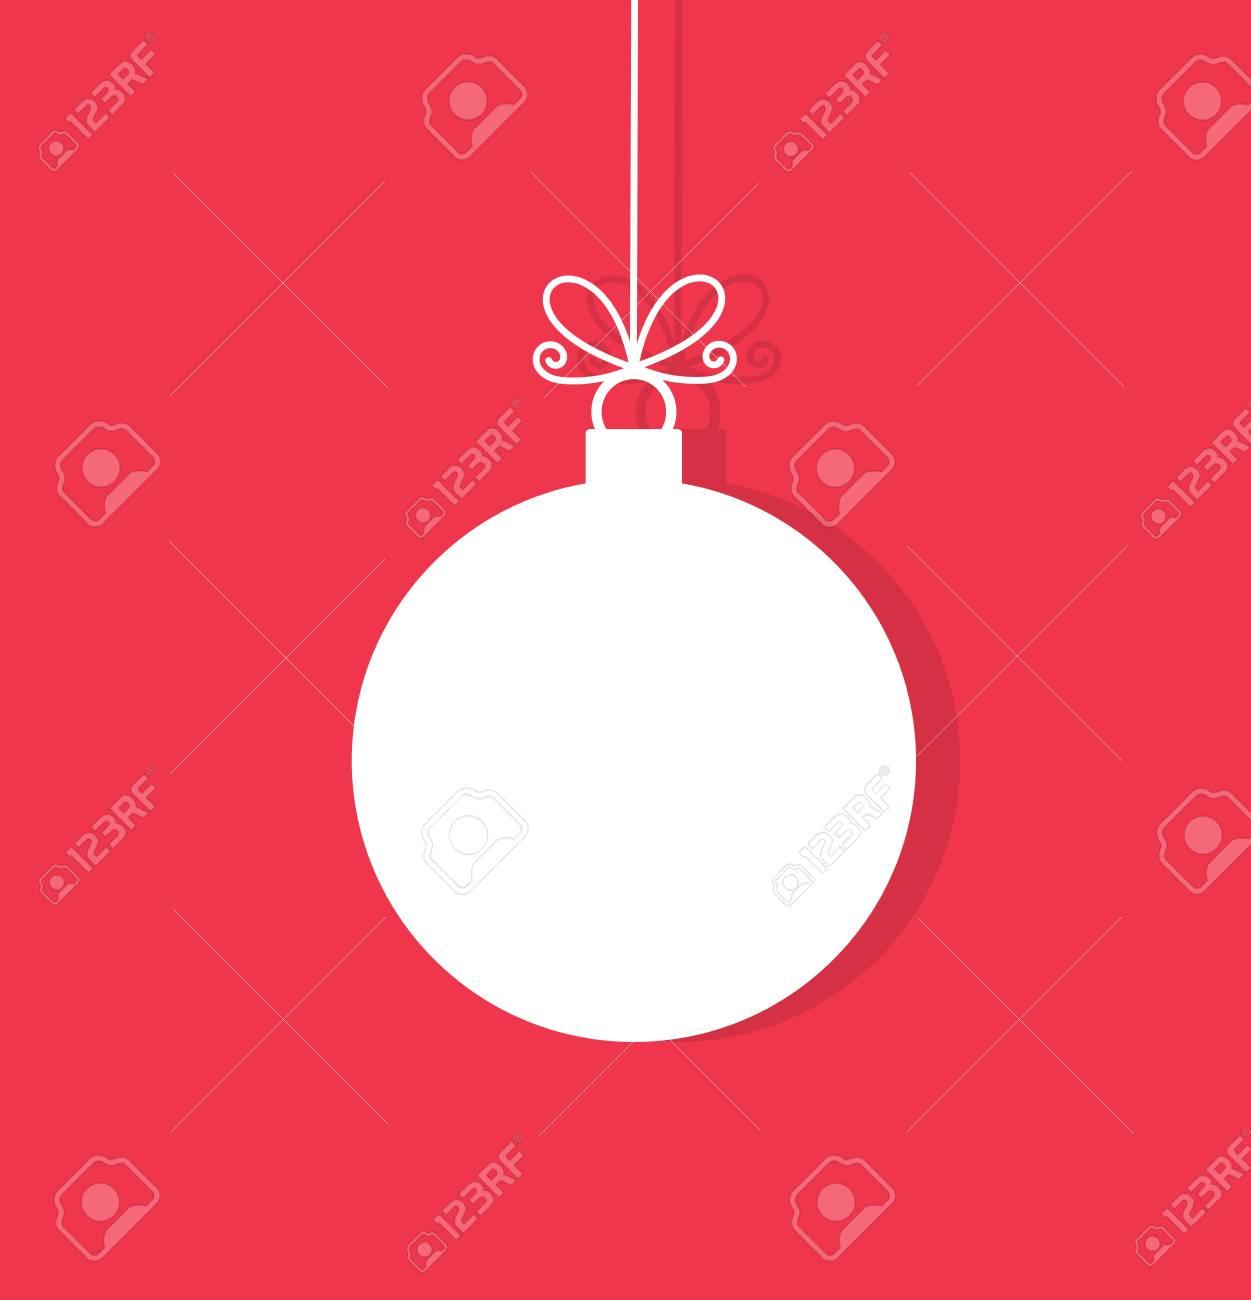 Christmas Ornament Vector.Christmas Ball Hanging Ornament Vector Illustration